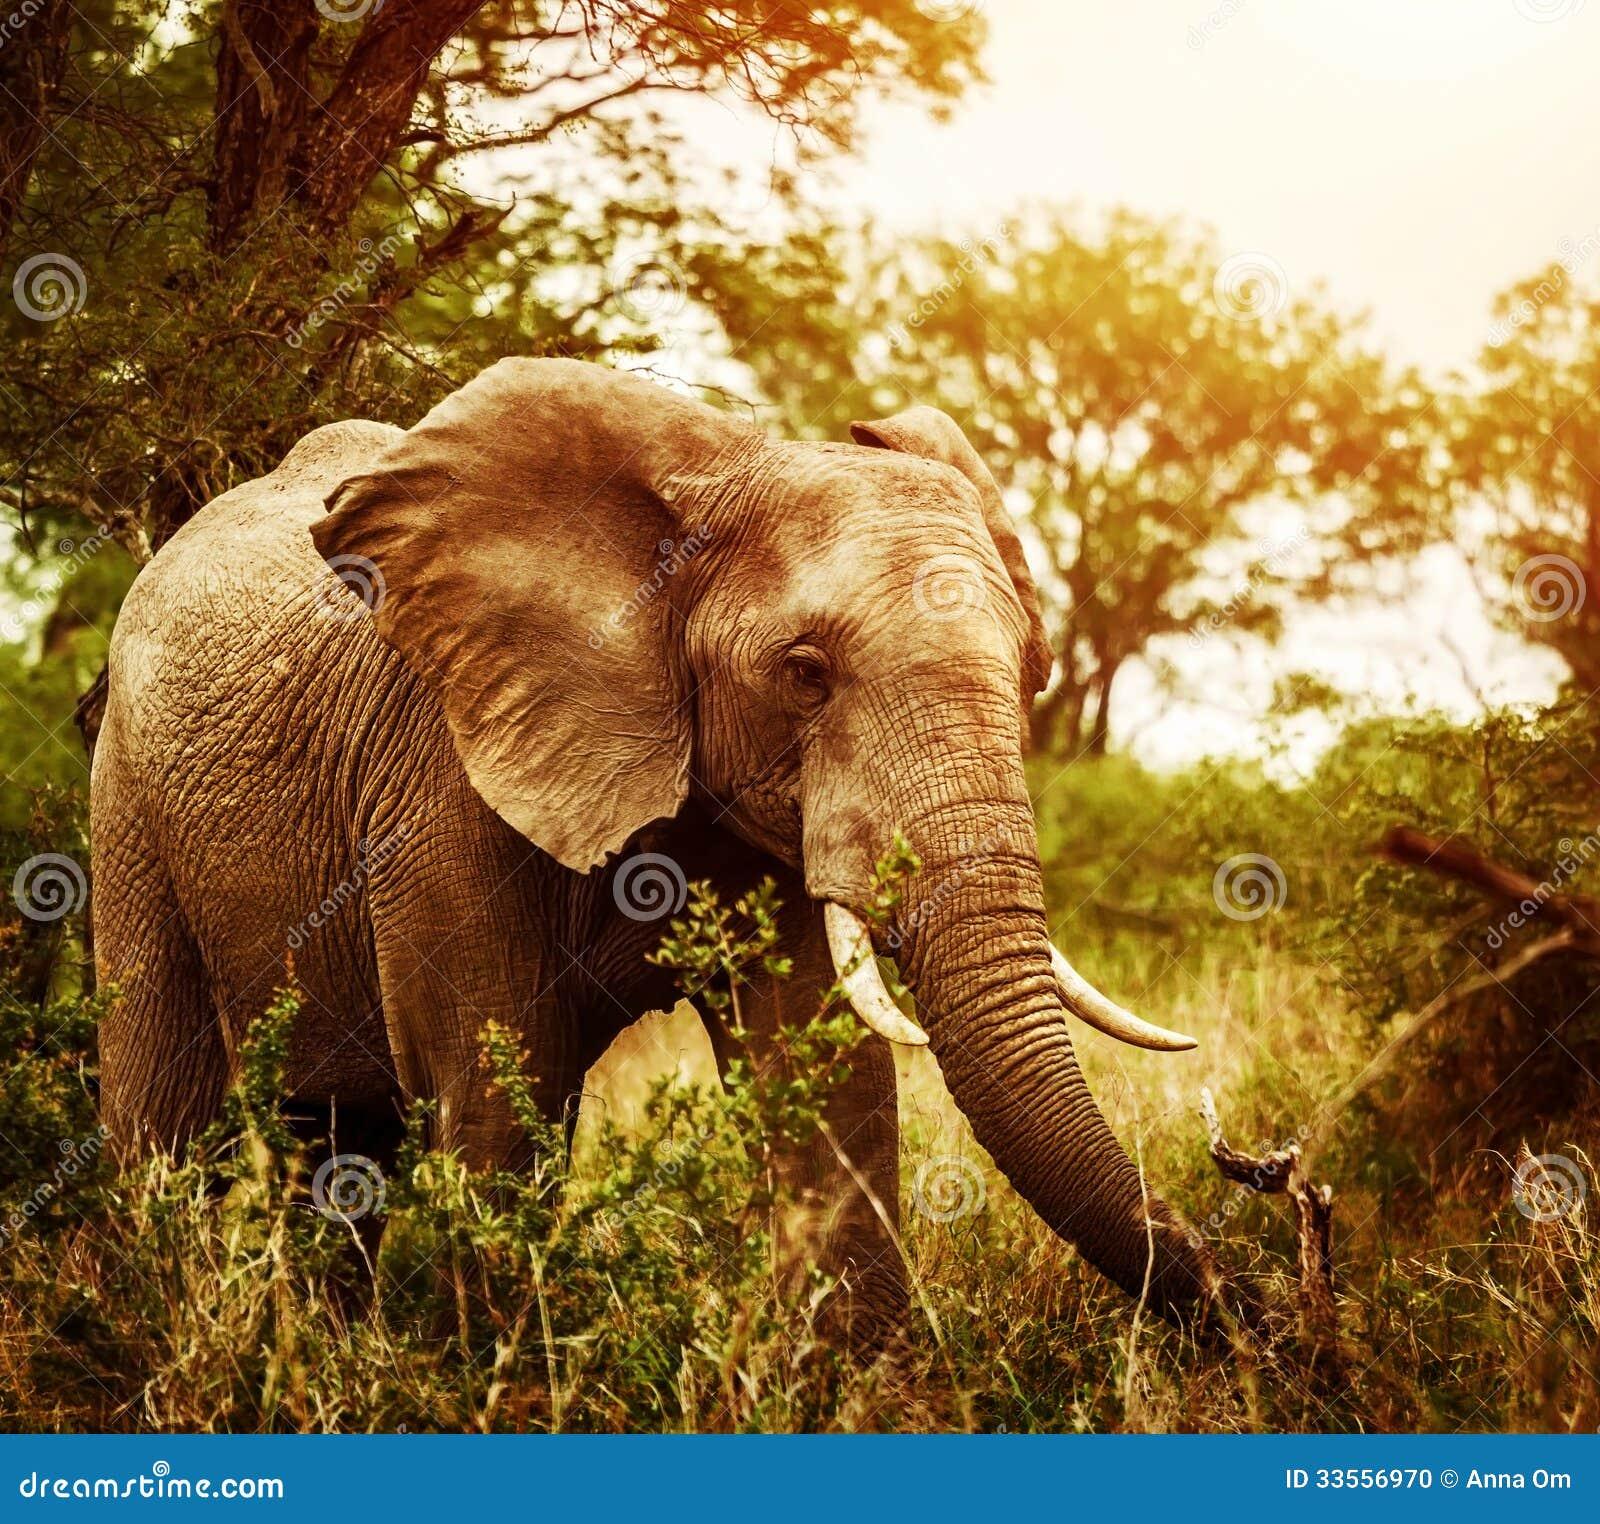 Huge Elephant Outdoors Stock Photo Image 33556970